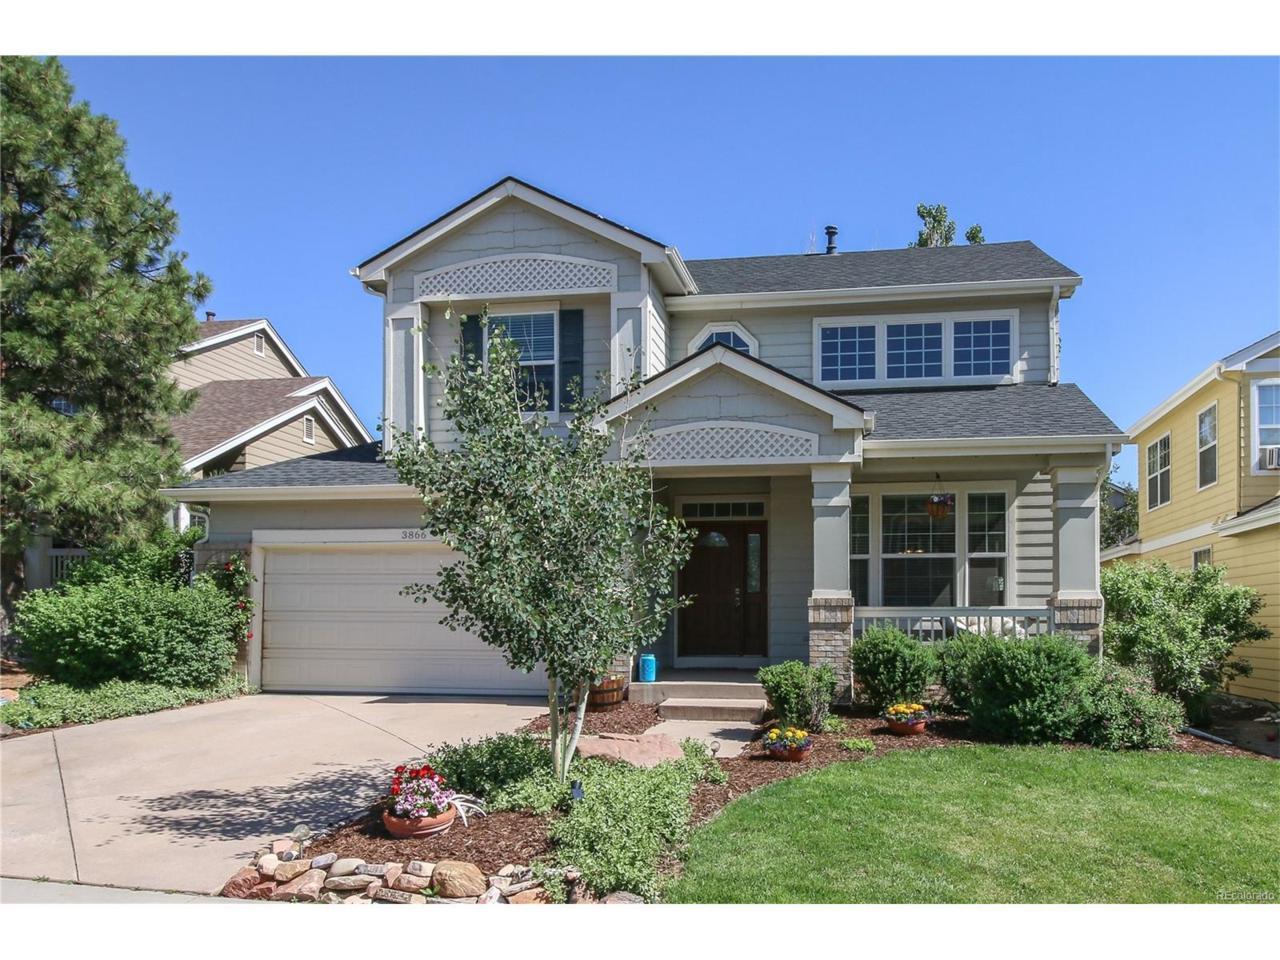 3866 Mallard Street, Highlands Ranch, CO 80126 (MLS #6900006) :: 8z Real Estate